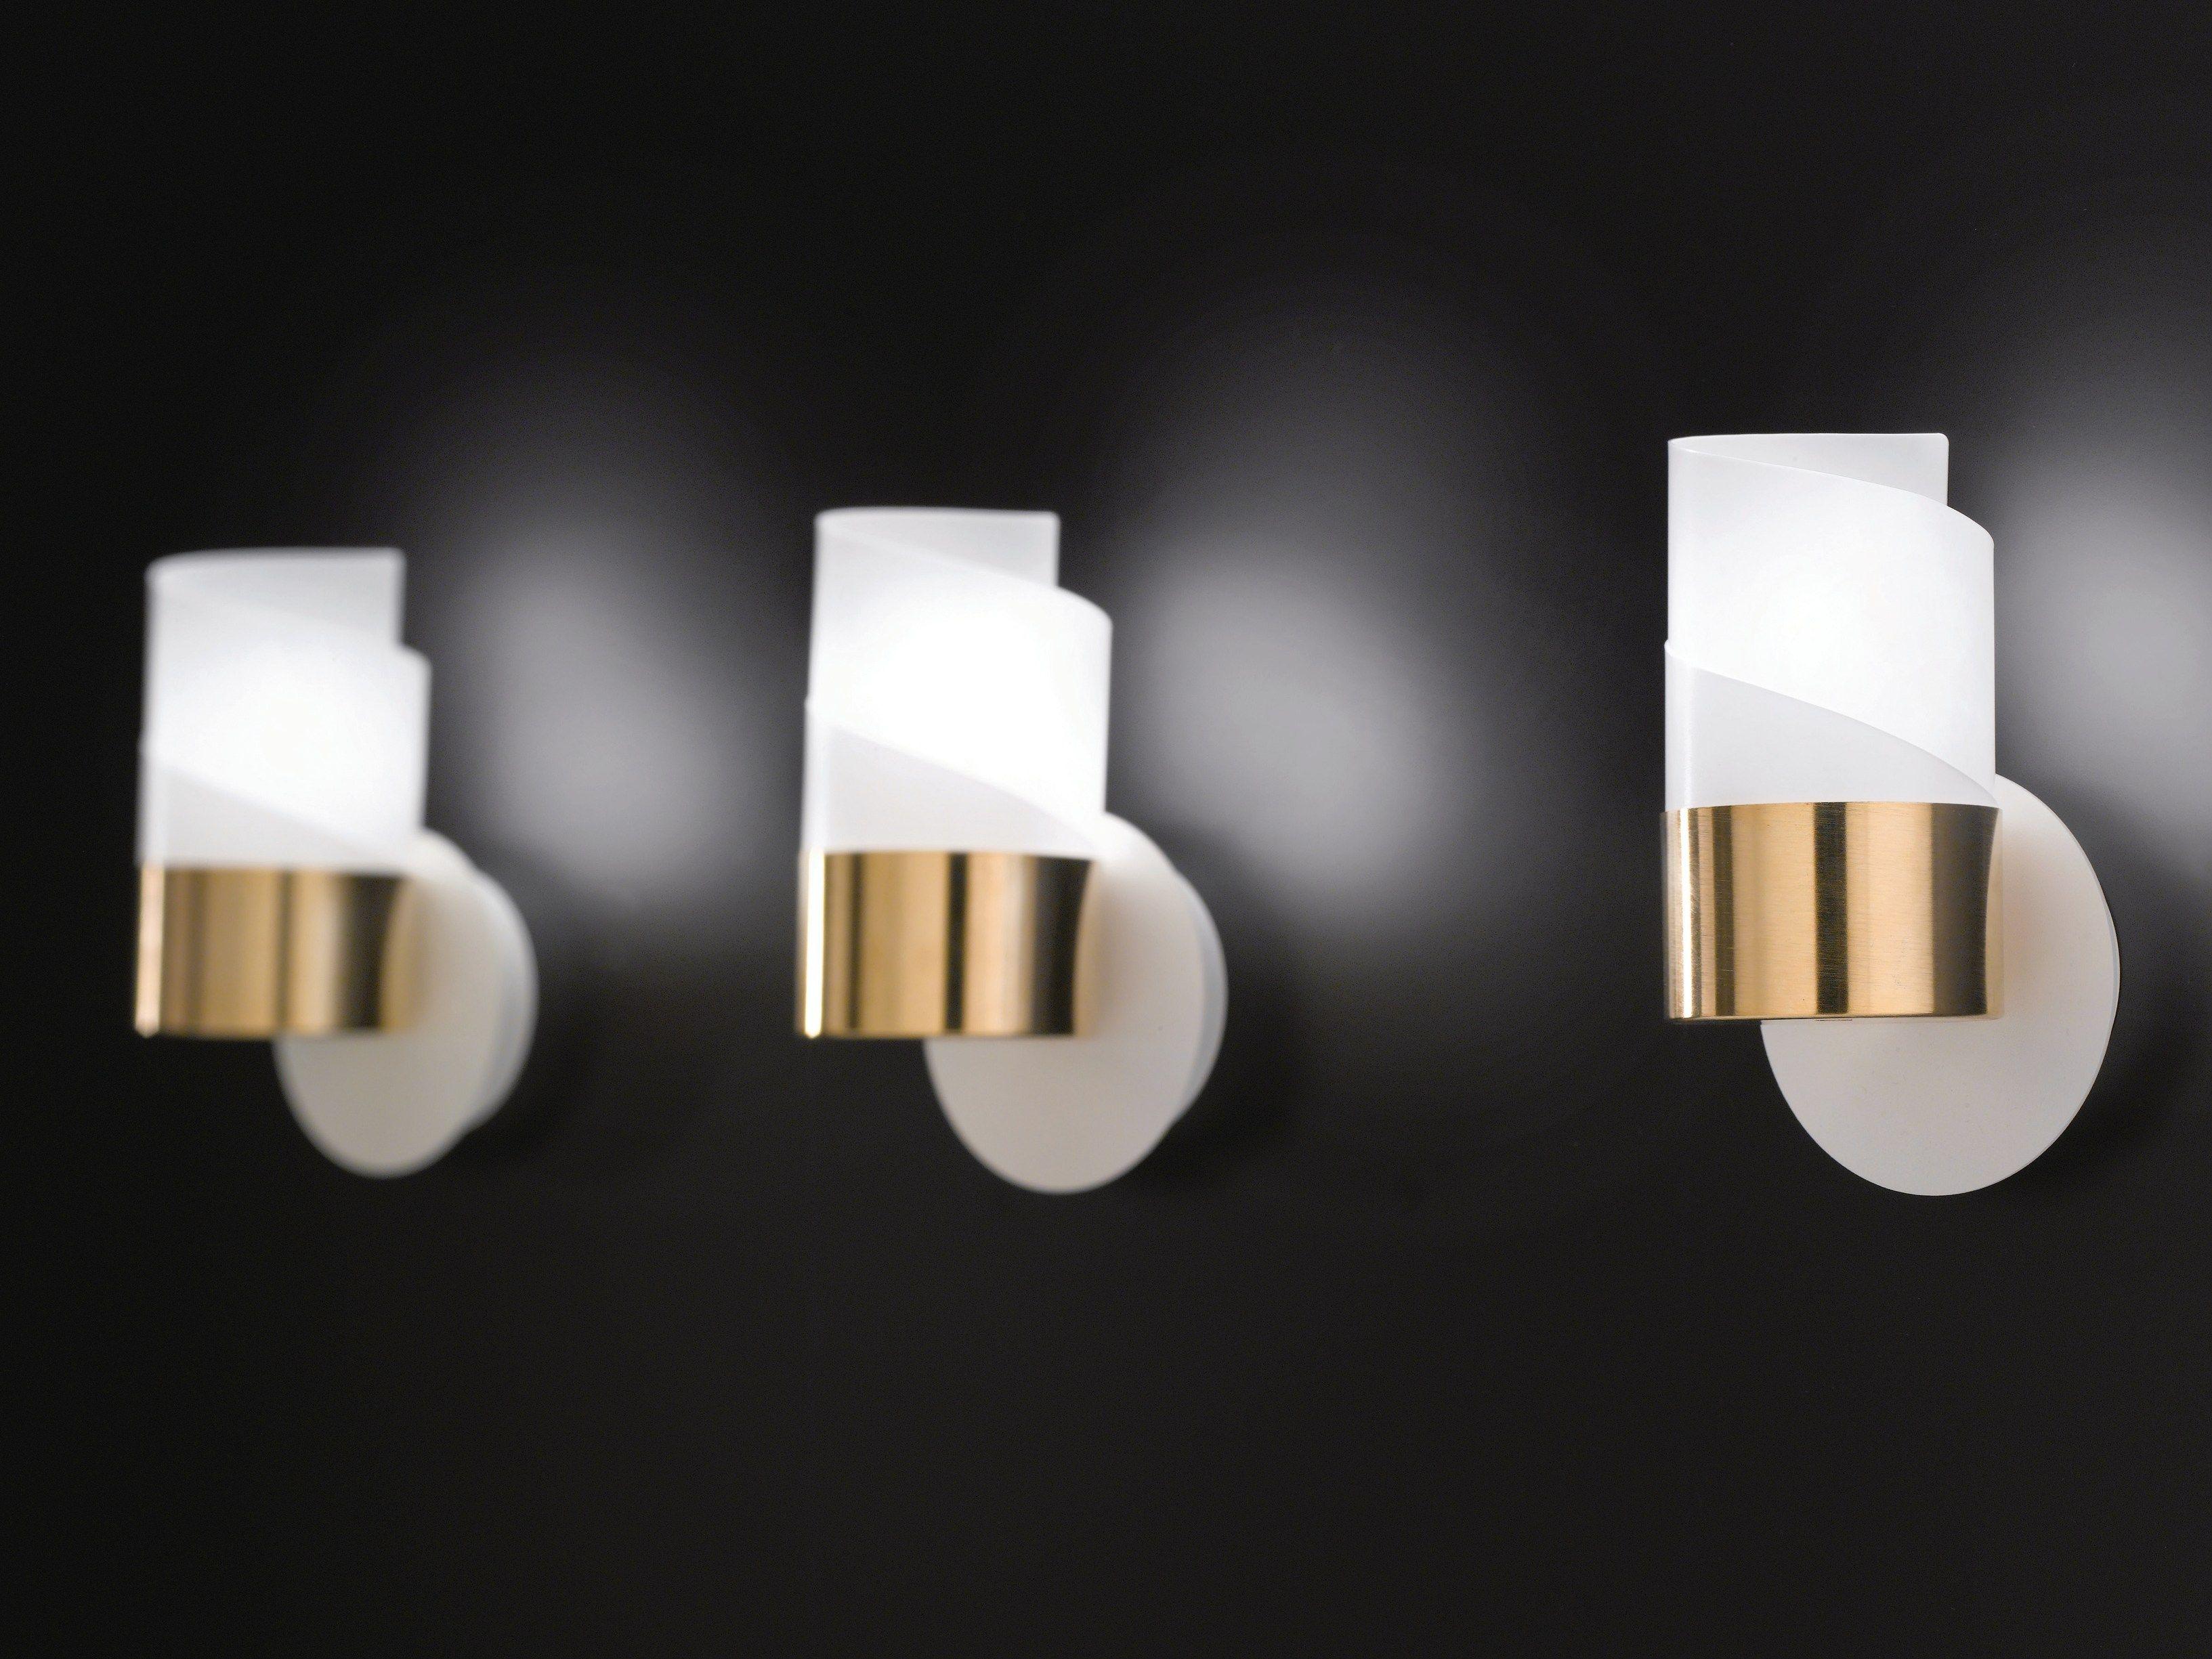 Lampade parete design comu fatta una lampada da parete a - Lampade a parete design ...